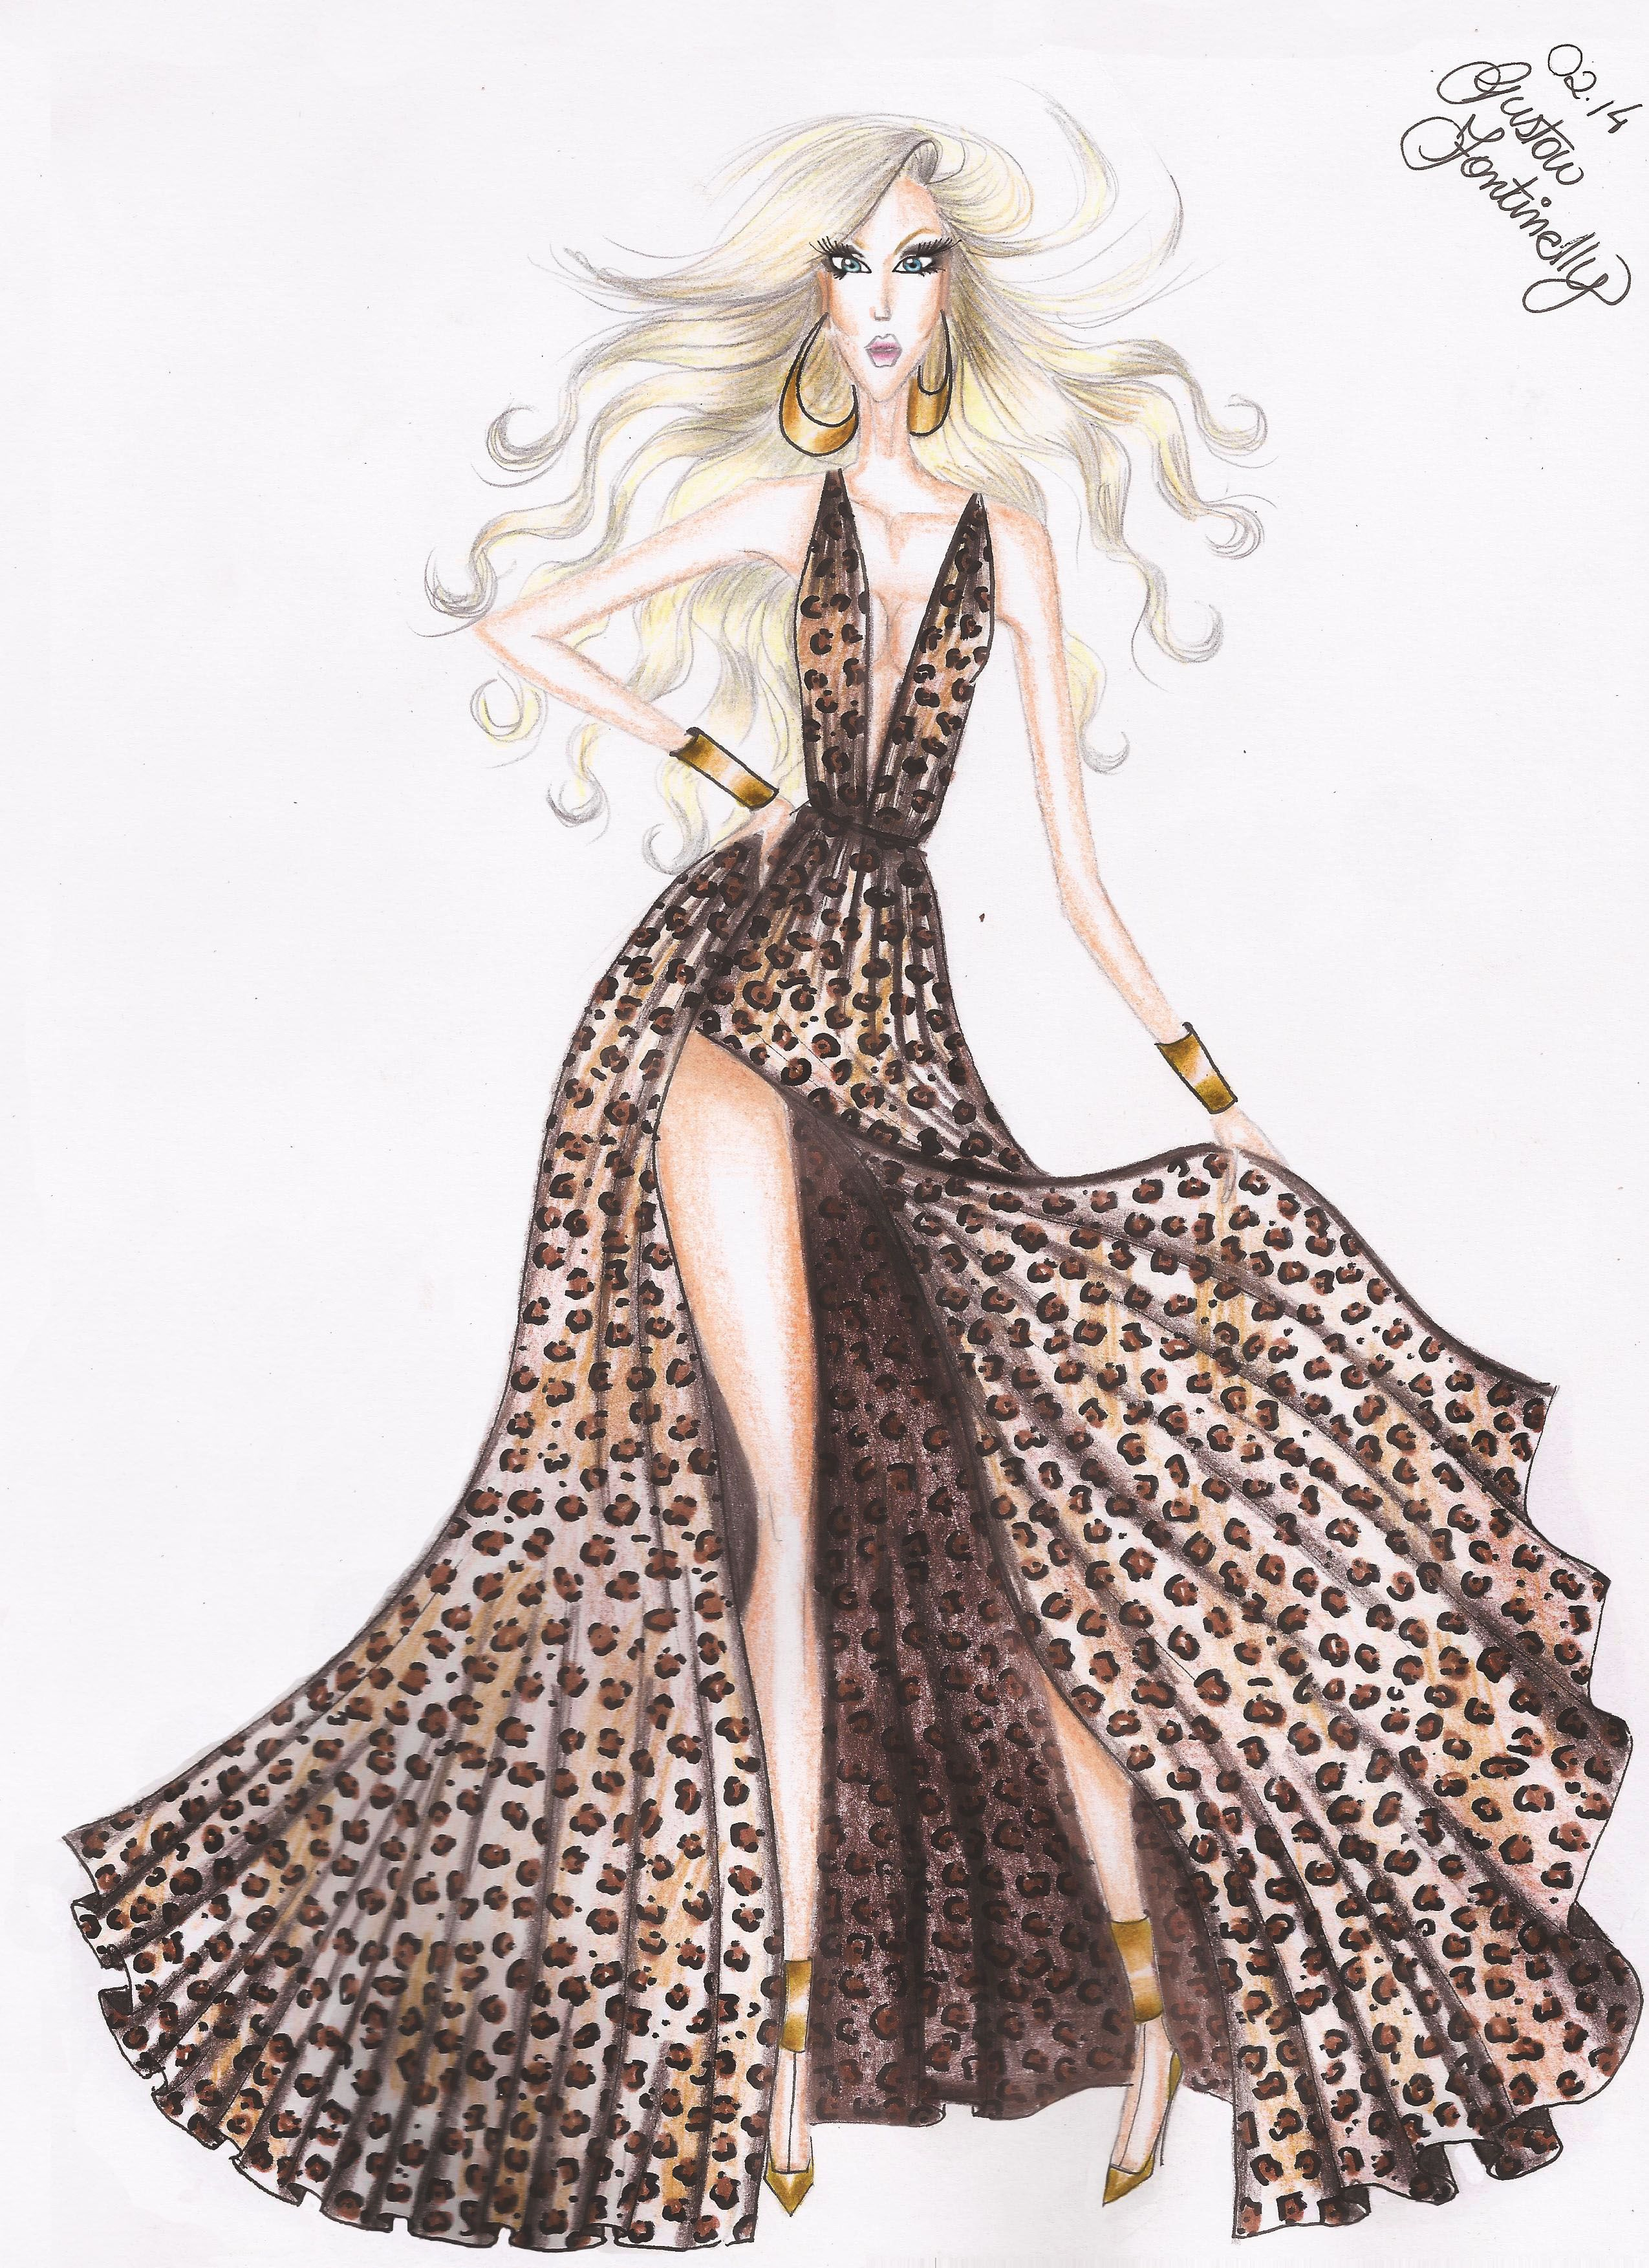 #fashion #fashiondesign #fashionillustrator